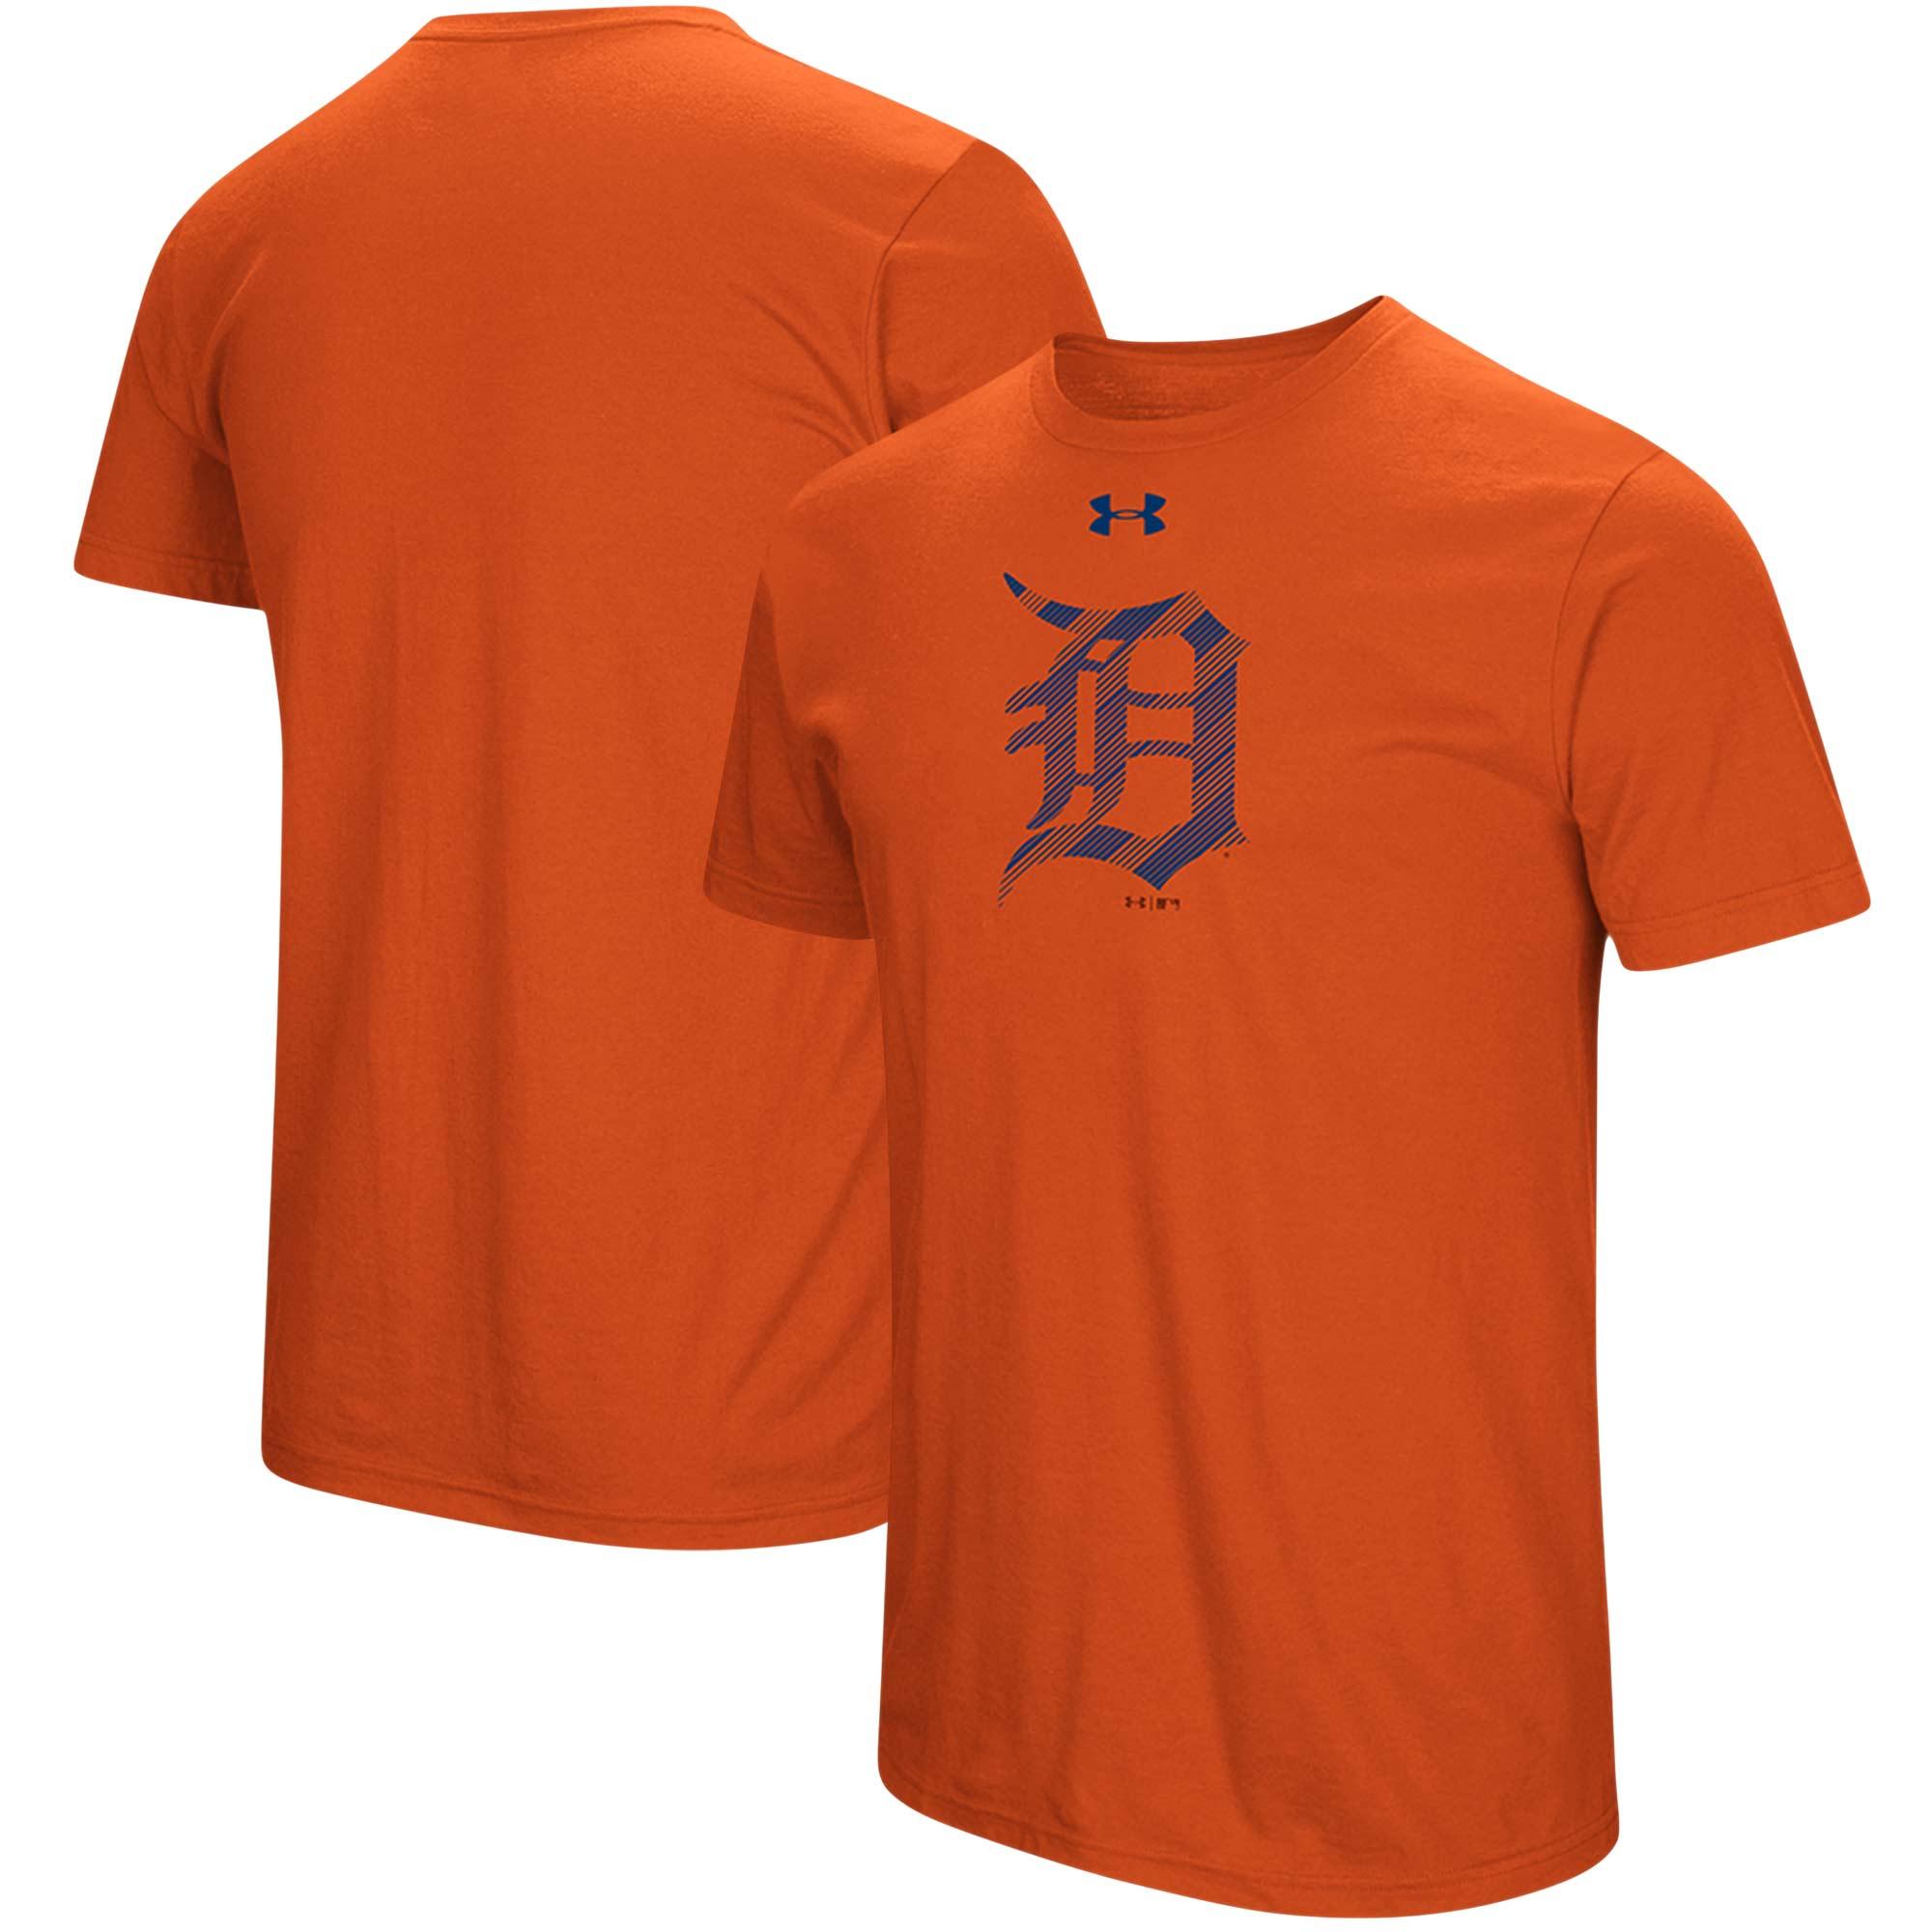 Detroit Tigers Under Armour Passion Alternate Logo T-Shirt - Orange